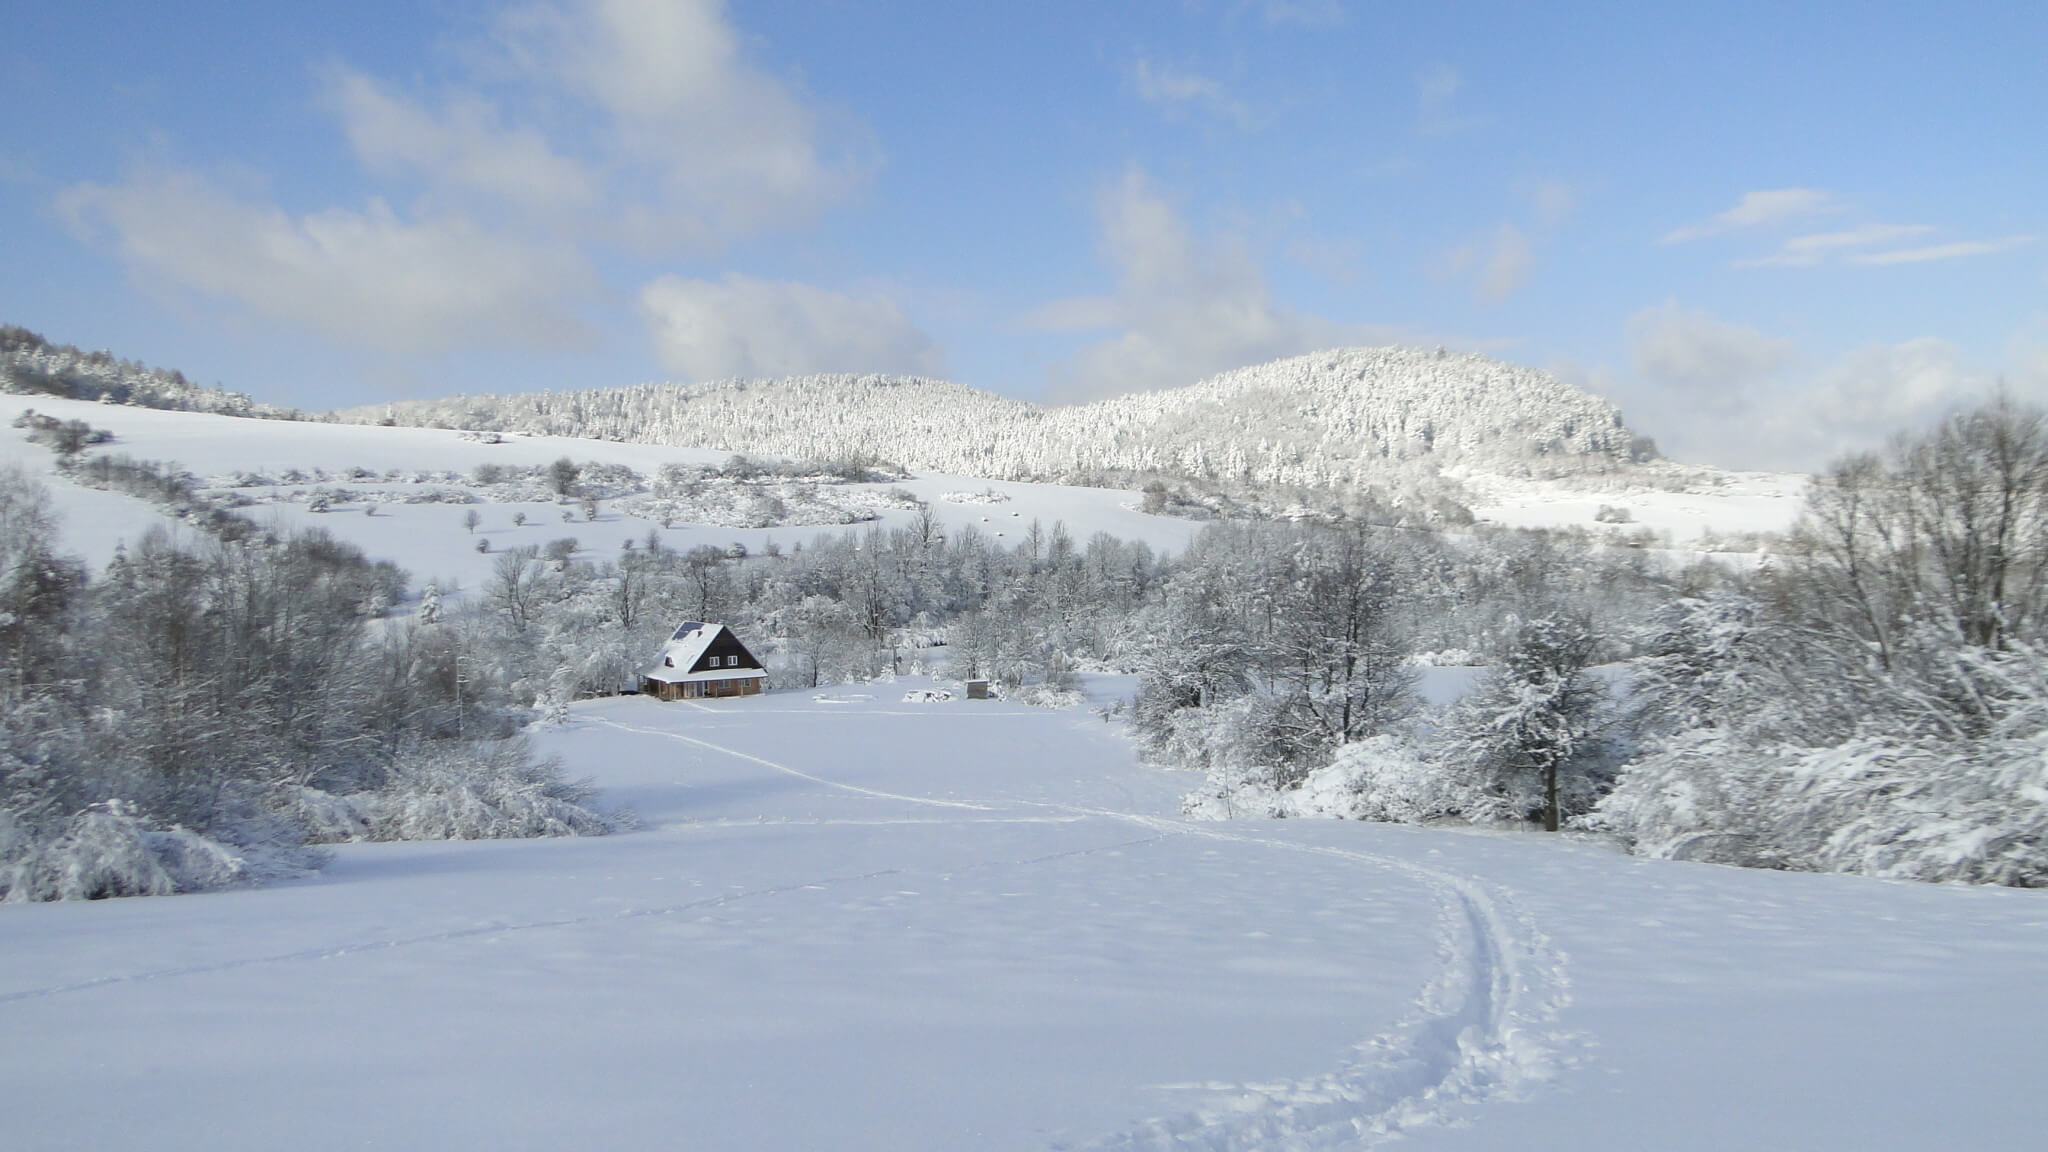 Lutowa zima - śnieżna i mroźna 6